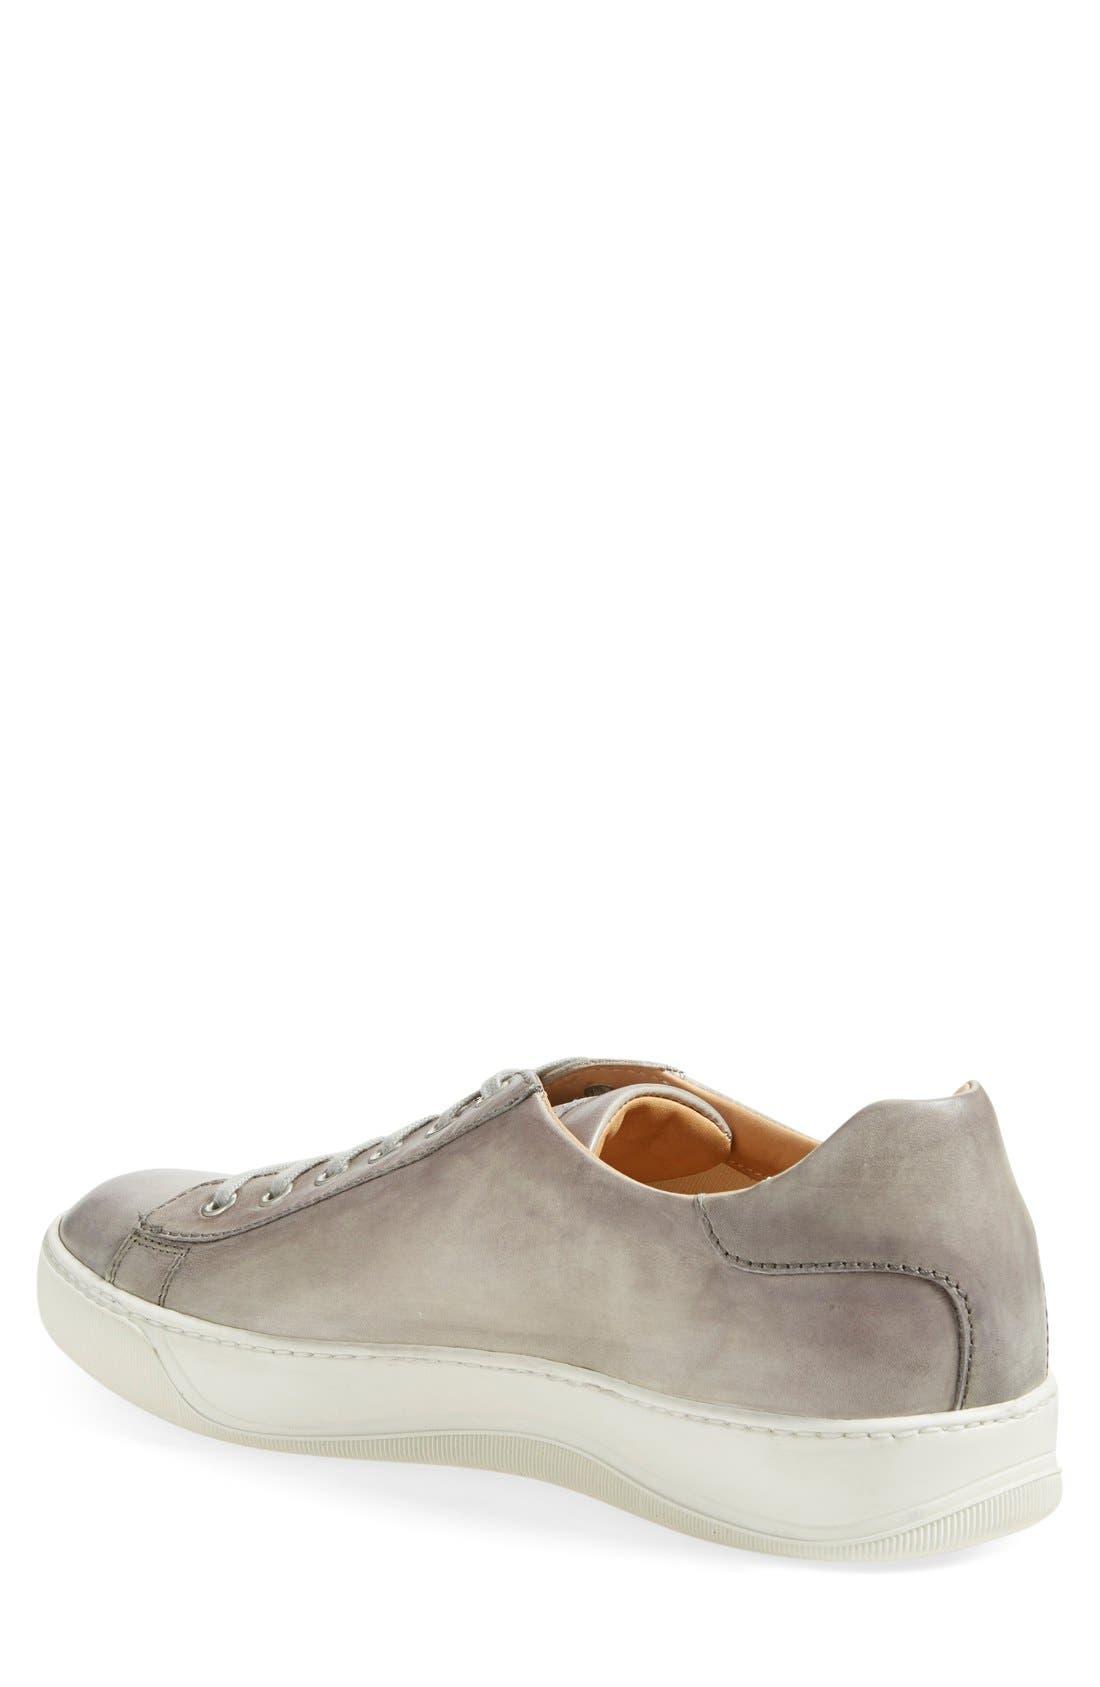 'Apache' Lace-Up Sneaker,                             Alternate thumbnail 7, color,